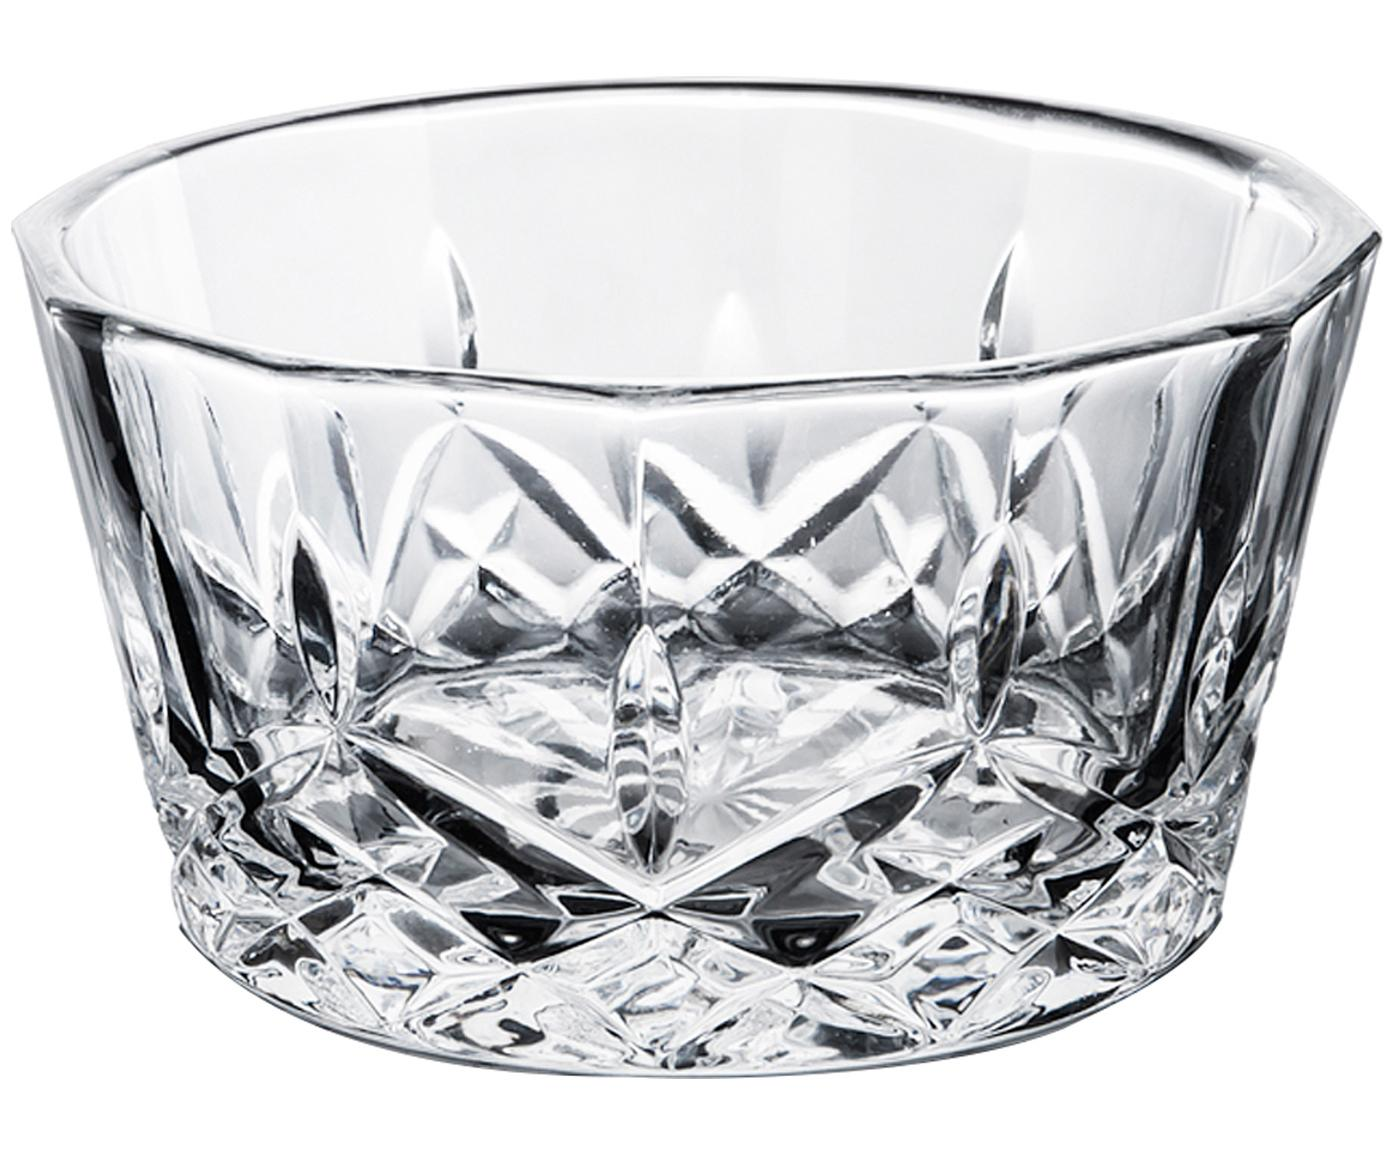 Schaal Harvey, 4 stuks, Glas, Transparant, Ø 11 cm x H 6 cm